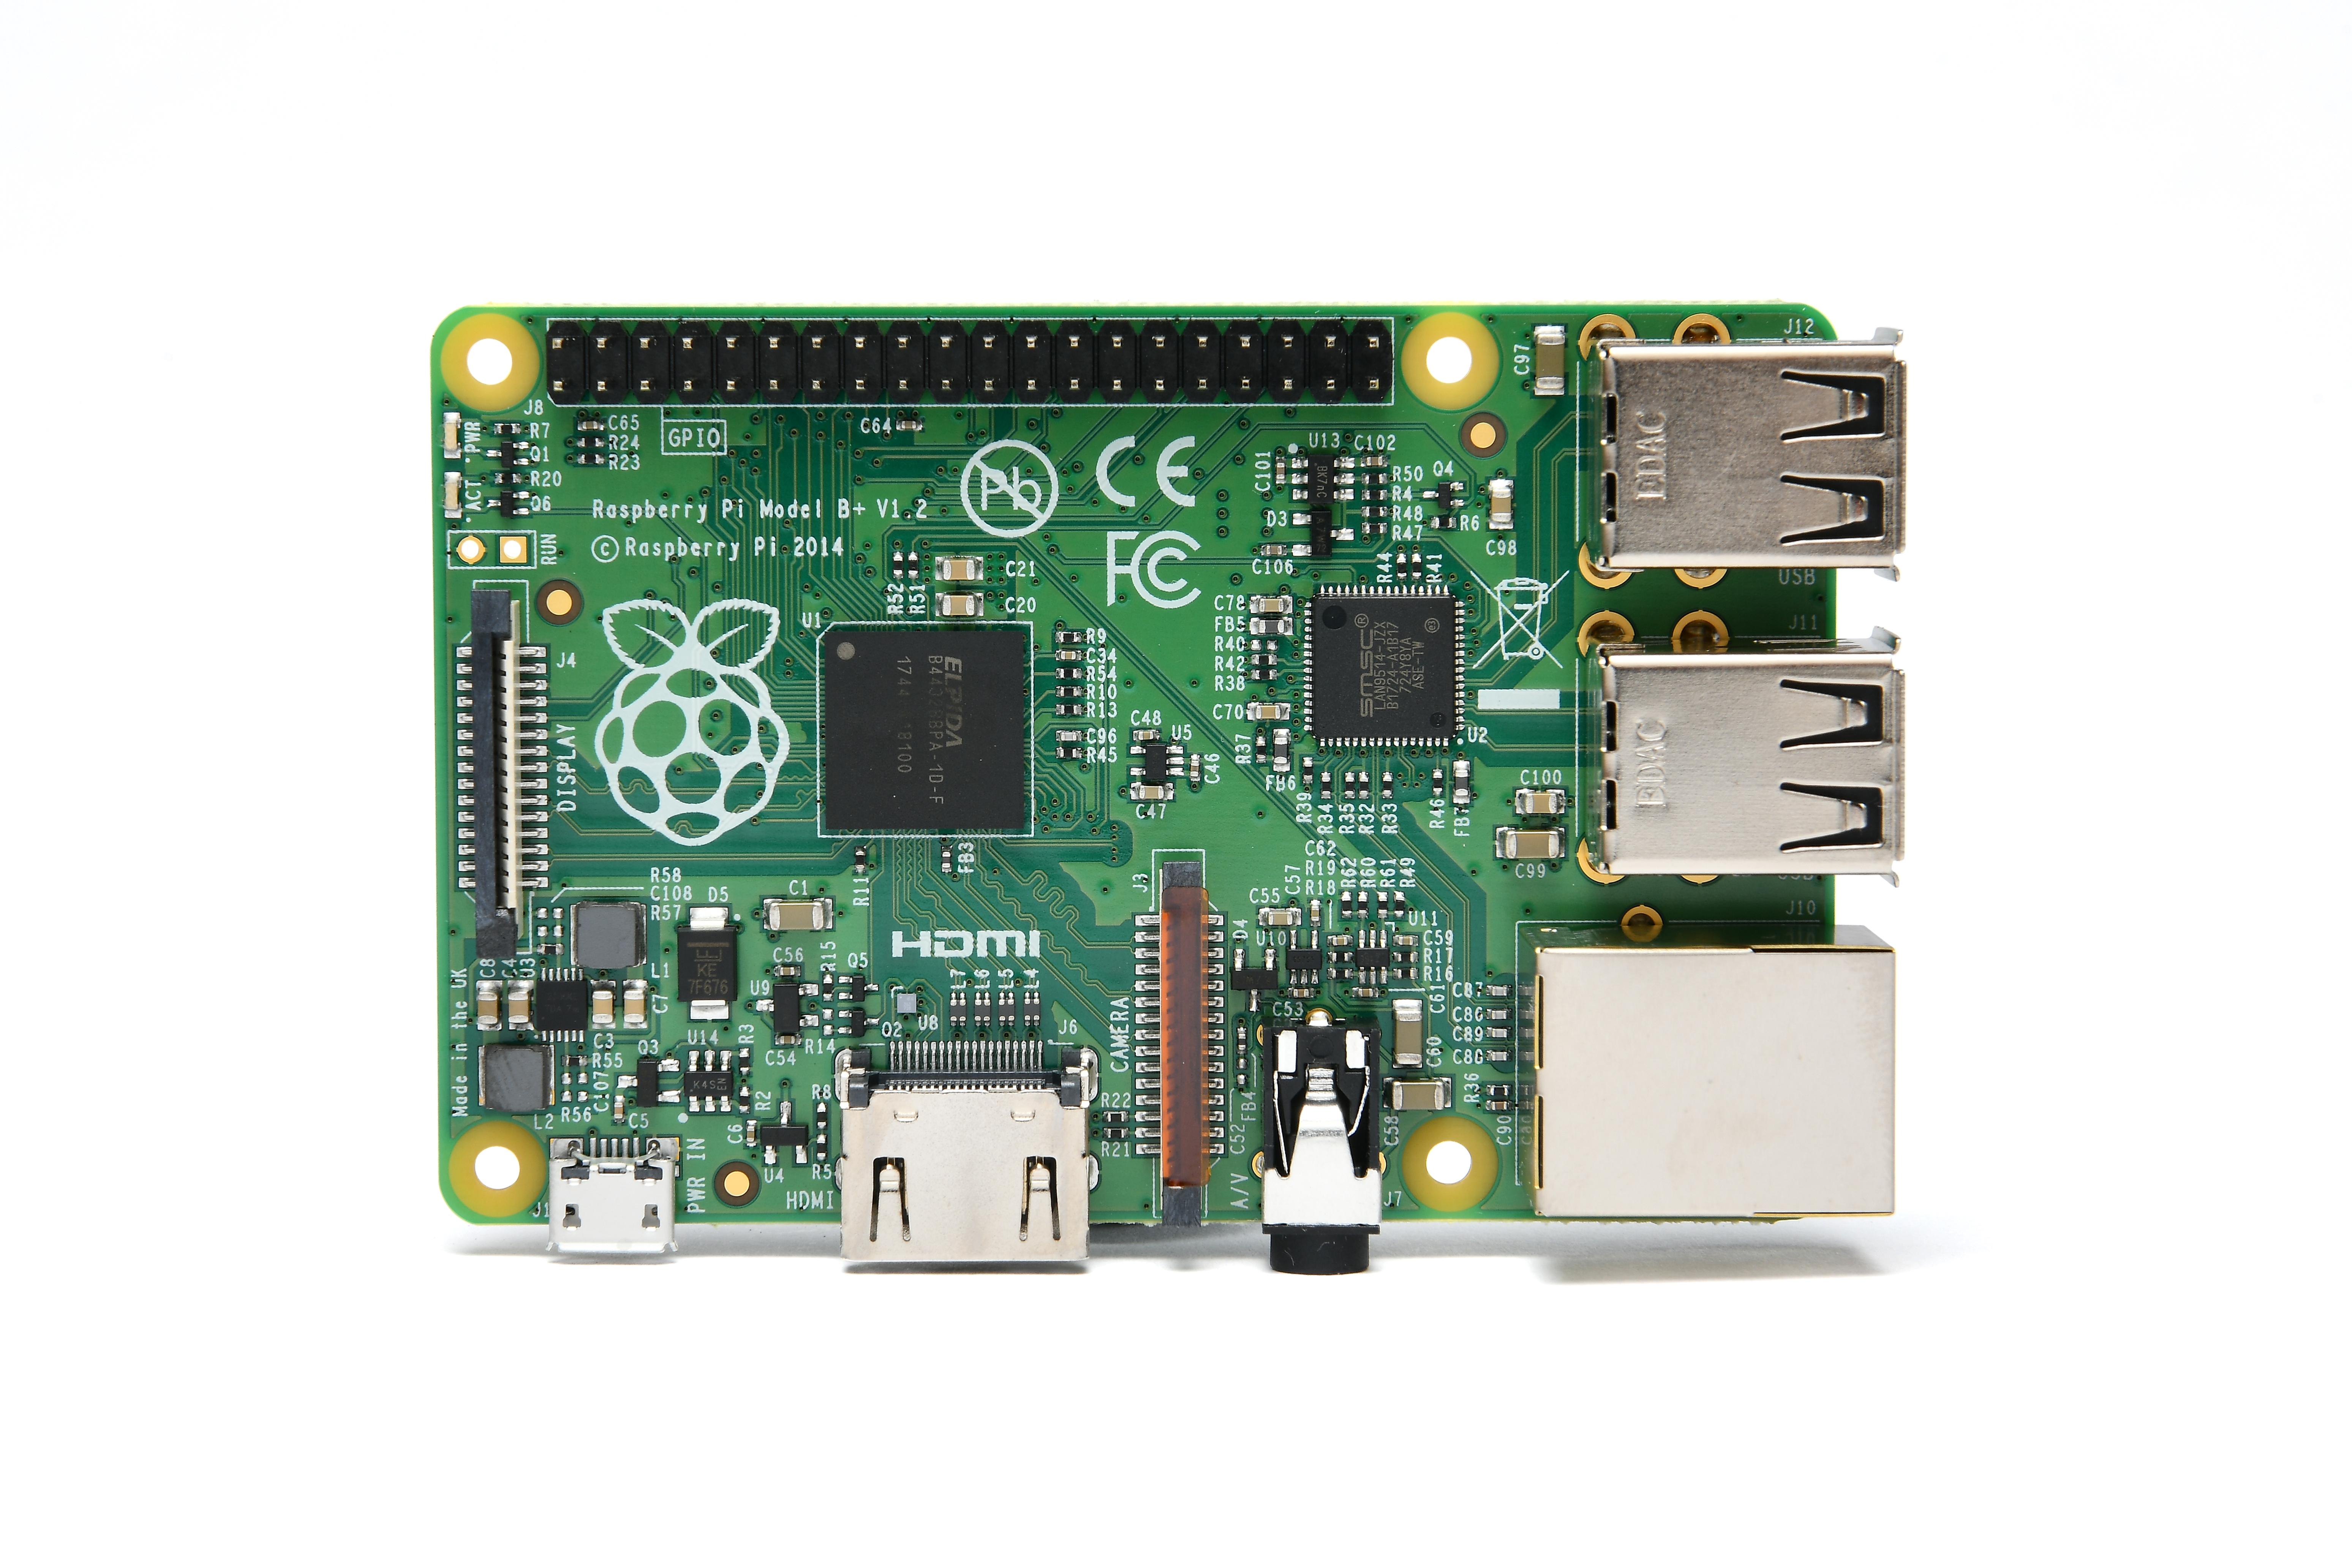 Raspberry Pi(ラズベリーパイ)Model B+